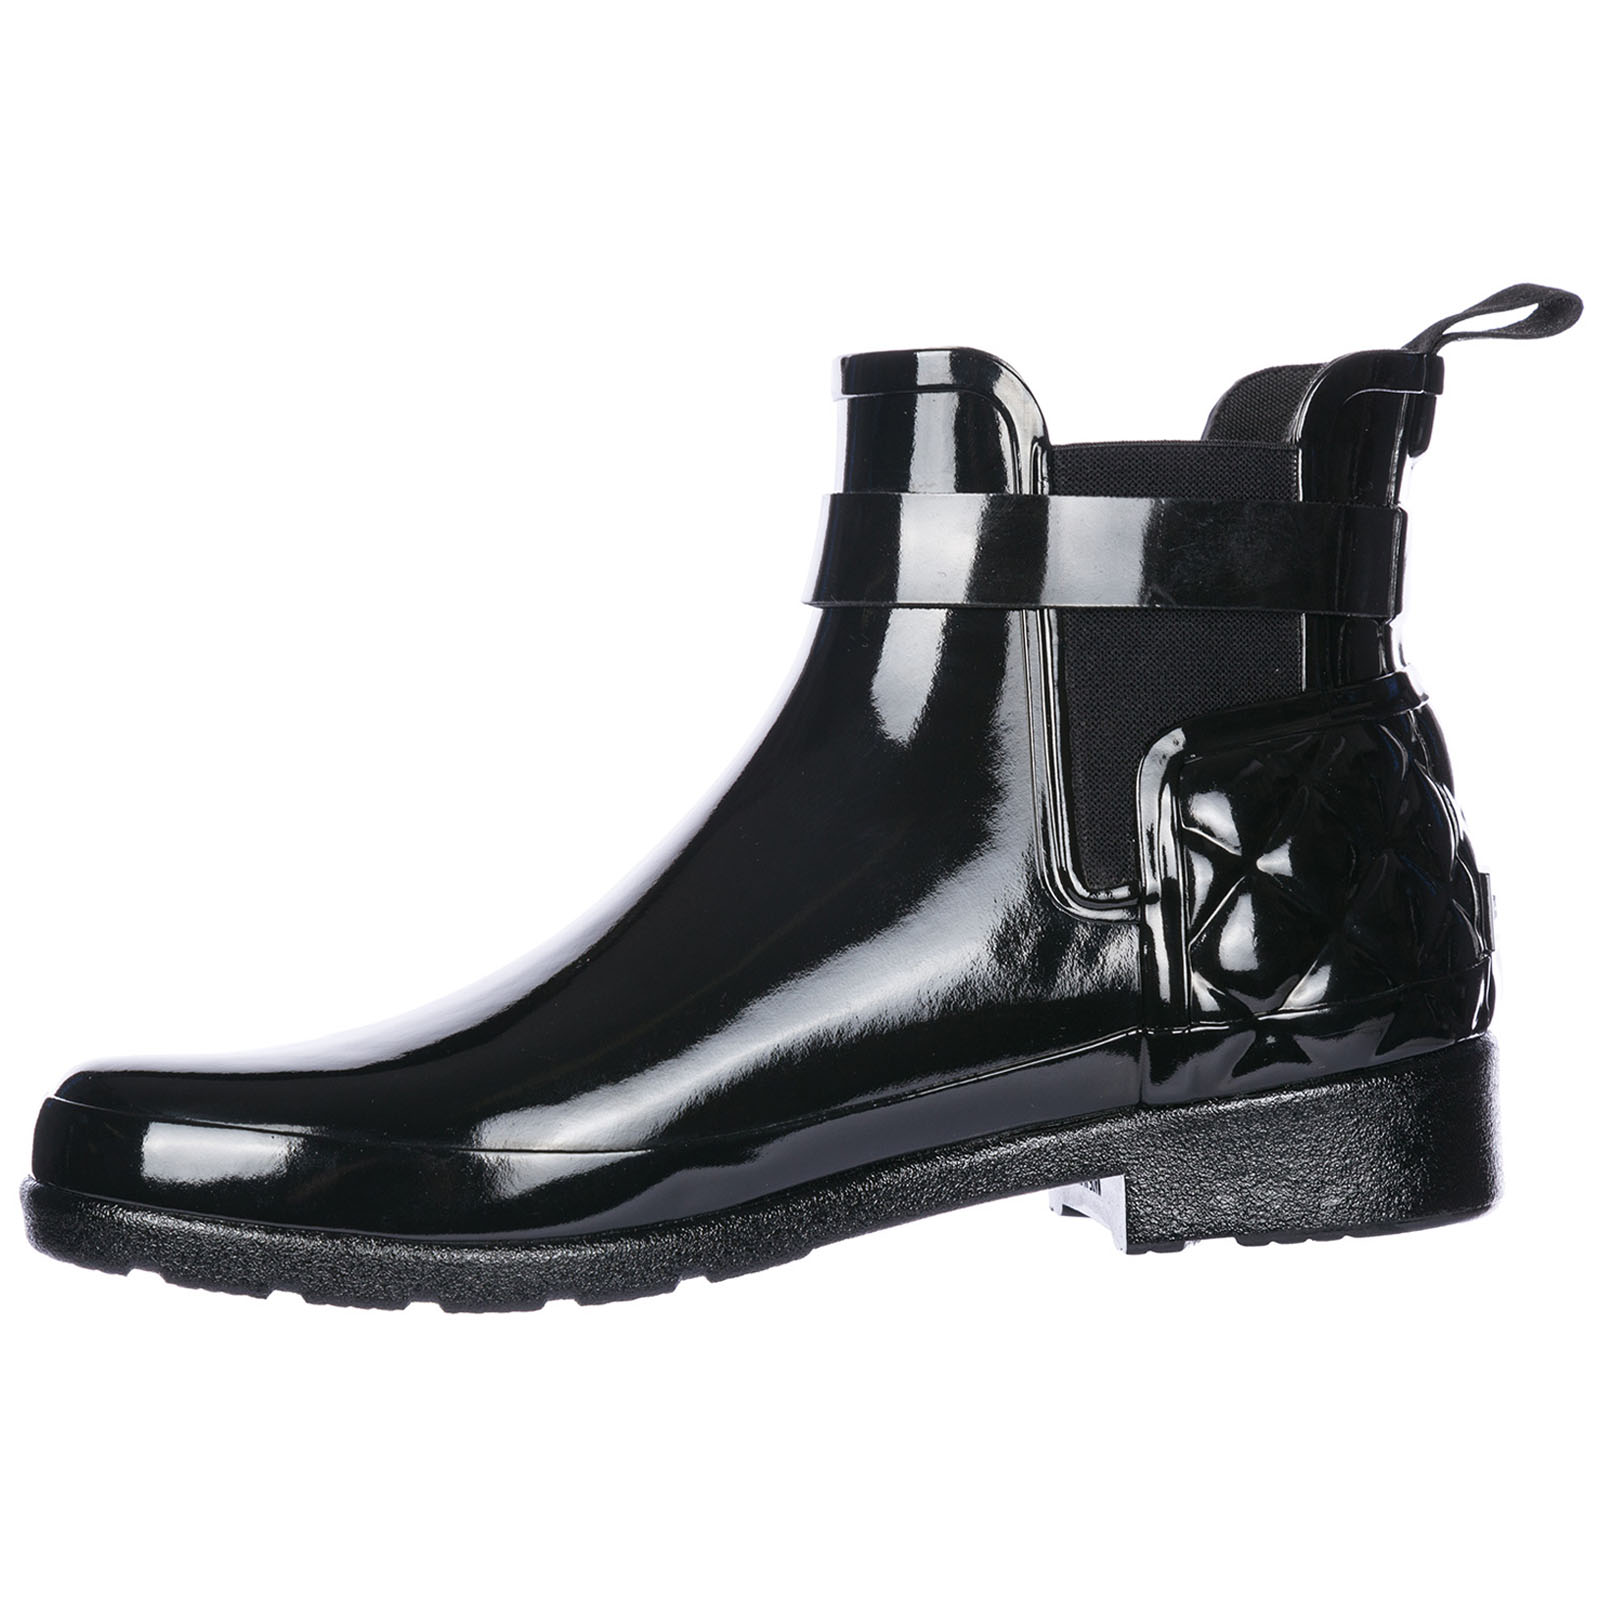 Boots Regen Gummi Damen Chelsea Stiefel K3TlFJcu1